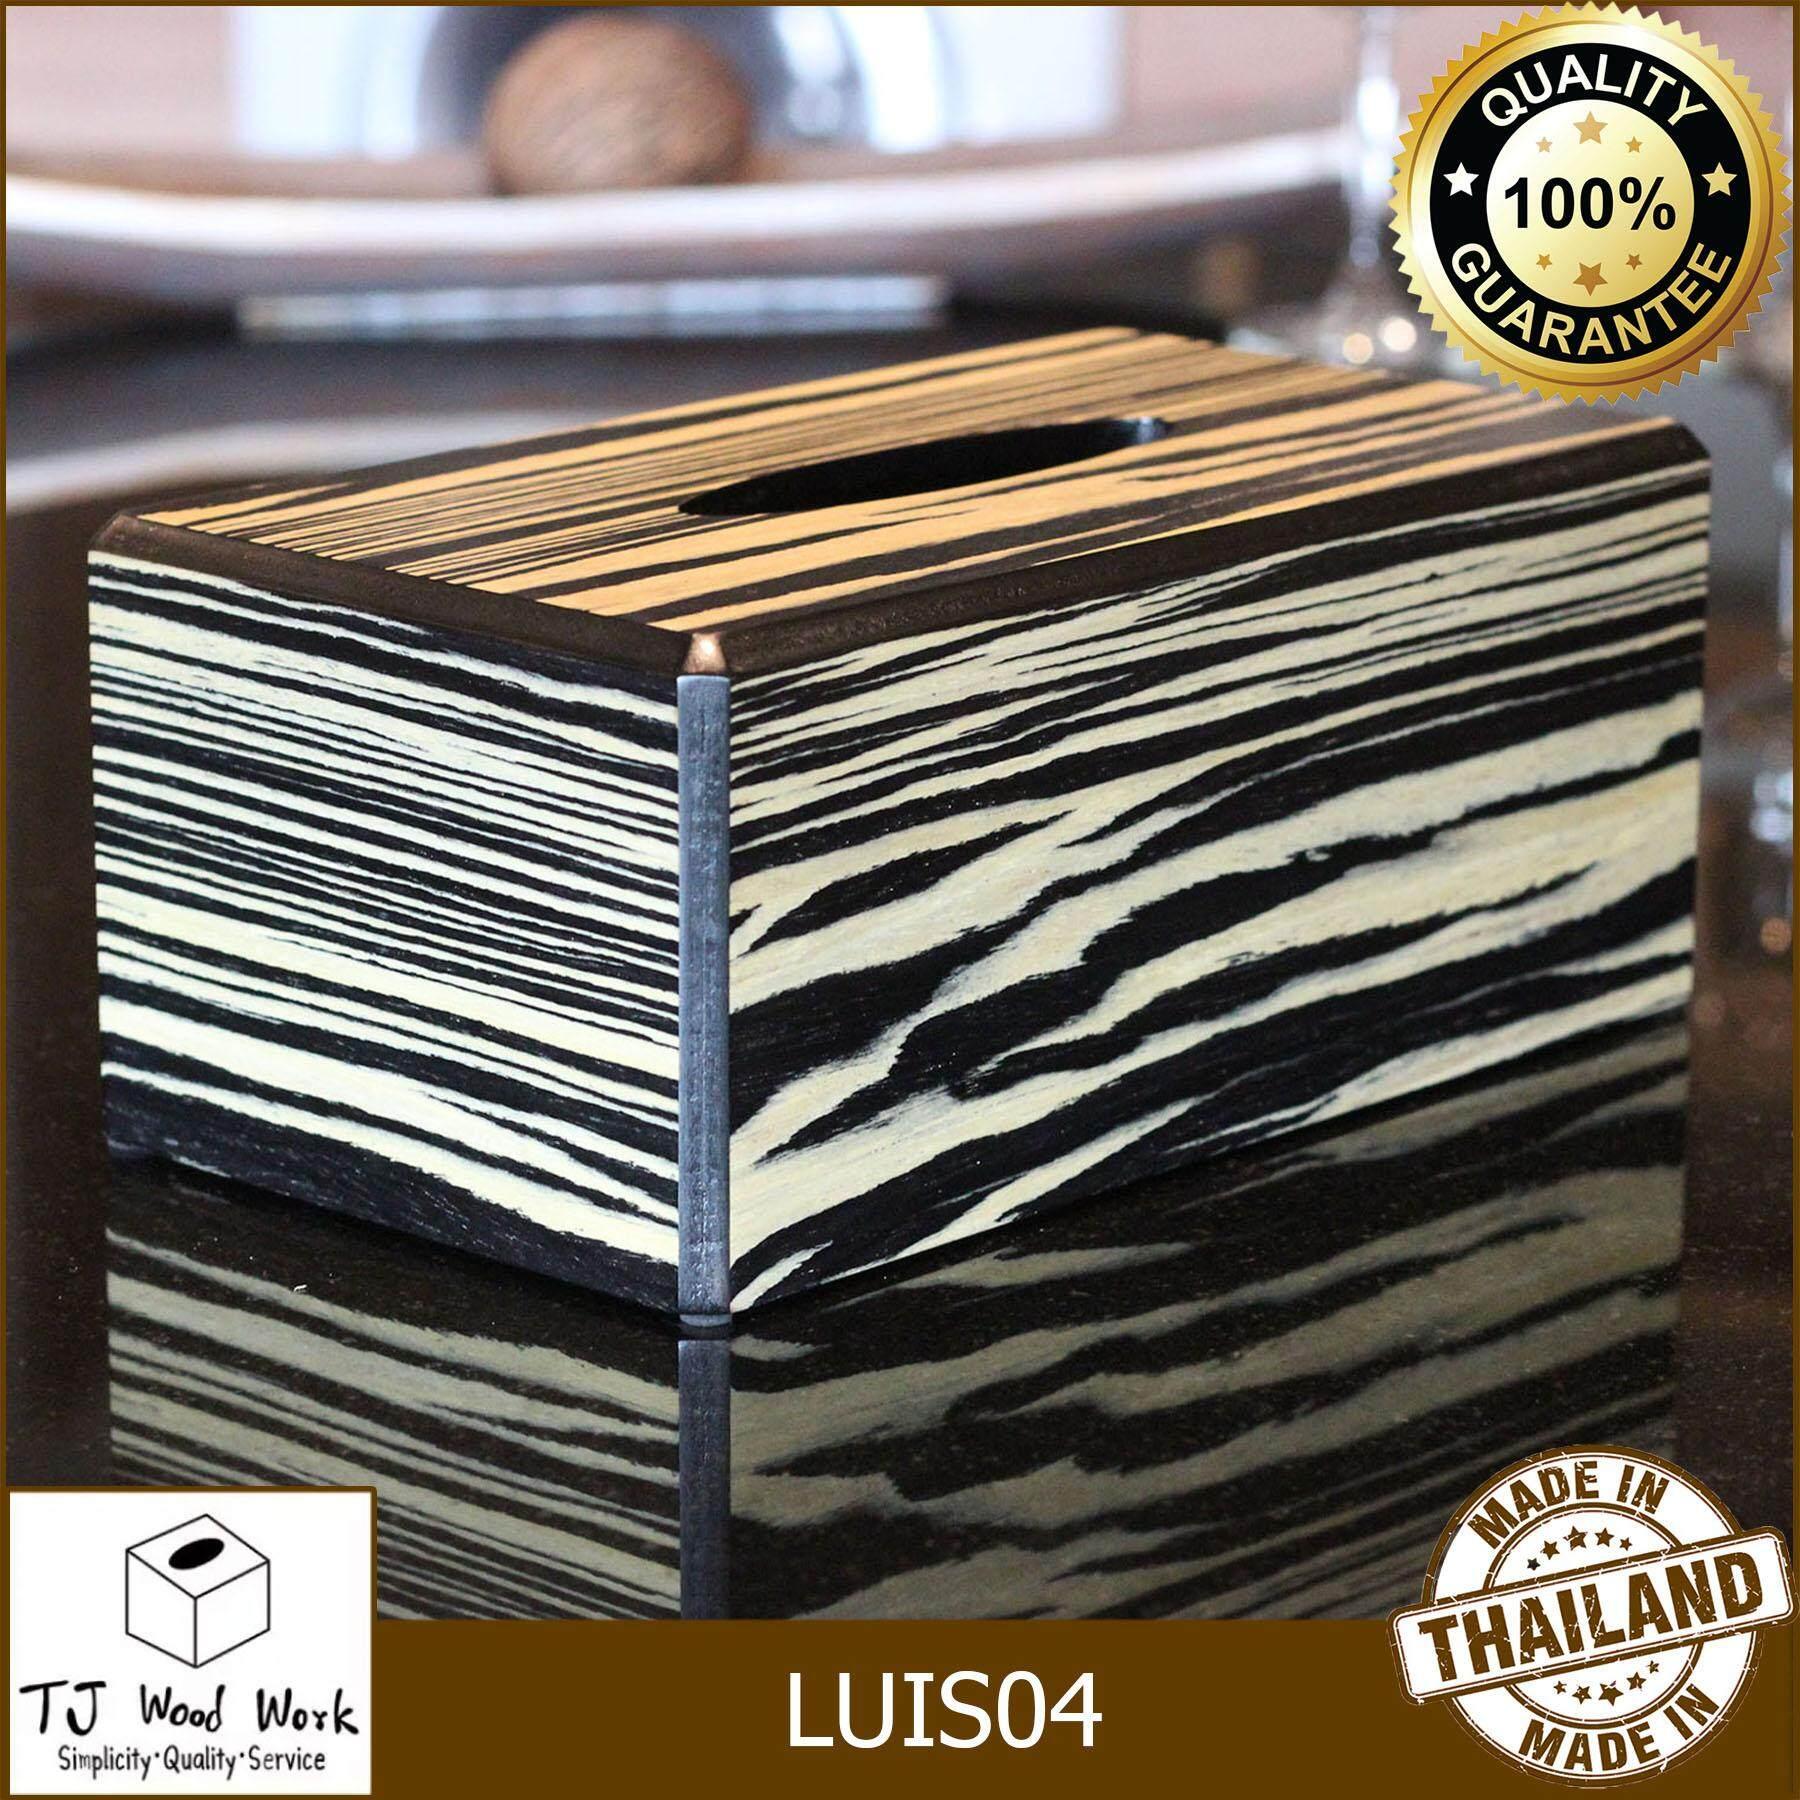 Cheapest today TJWW WOODEN TISSUE BOX กล่องใส่กระดาษทิชชู่ผิวเนื้อไม้ซีบราโน ขนาดใหญ่ ขนาด26x14.5x10.5 cm ล่าสุด - มีเพียง ฿284.10